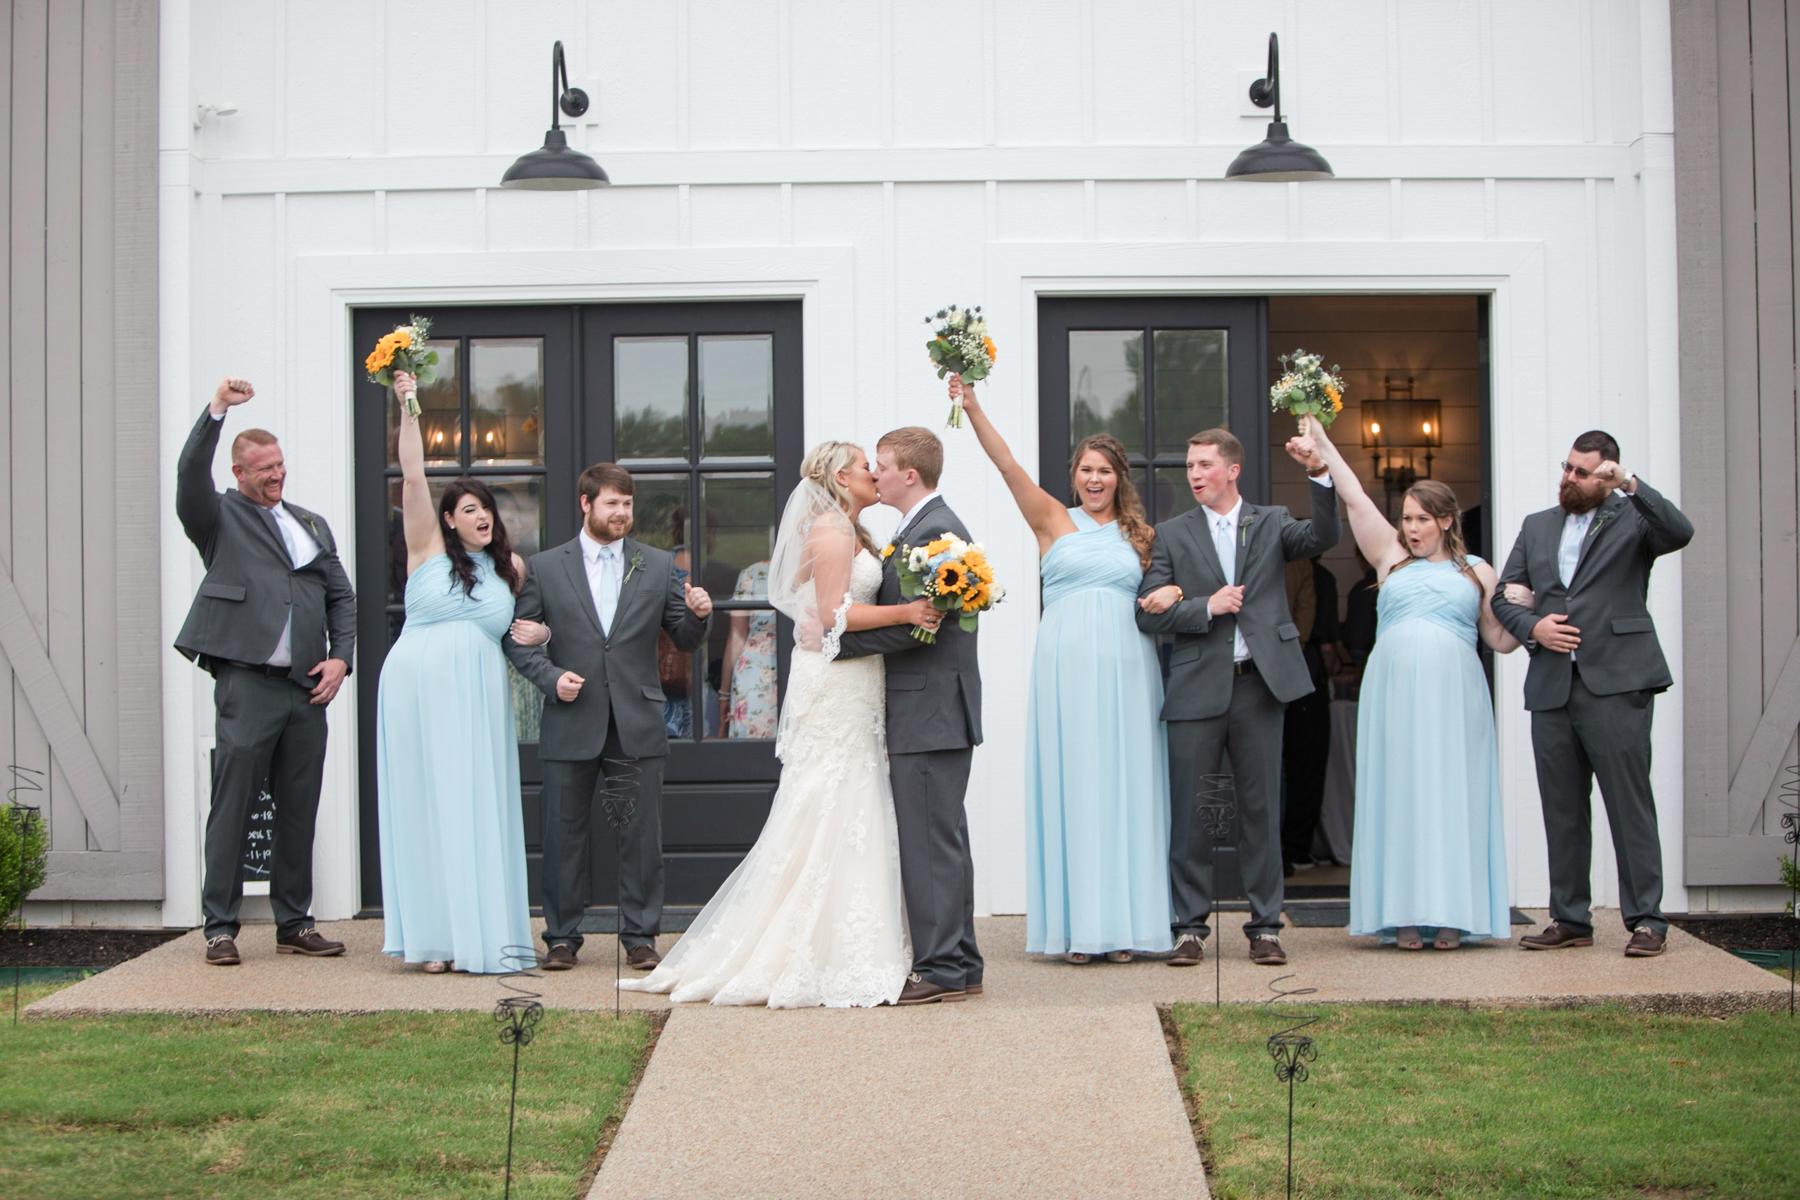 The-venue-at-white-oak-farms-wedding-nashville-wedding-photographers-0174.jpg